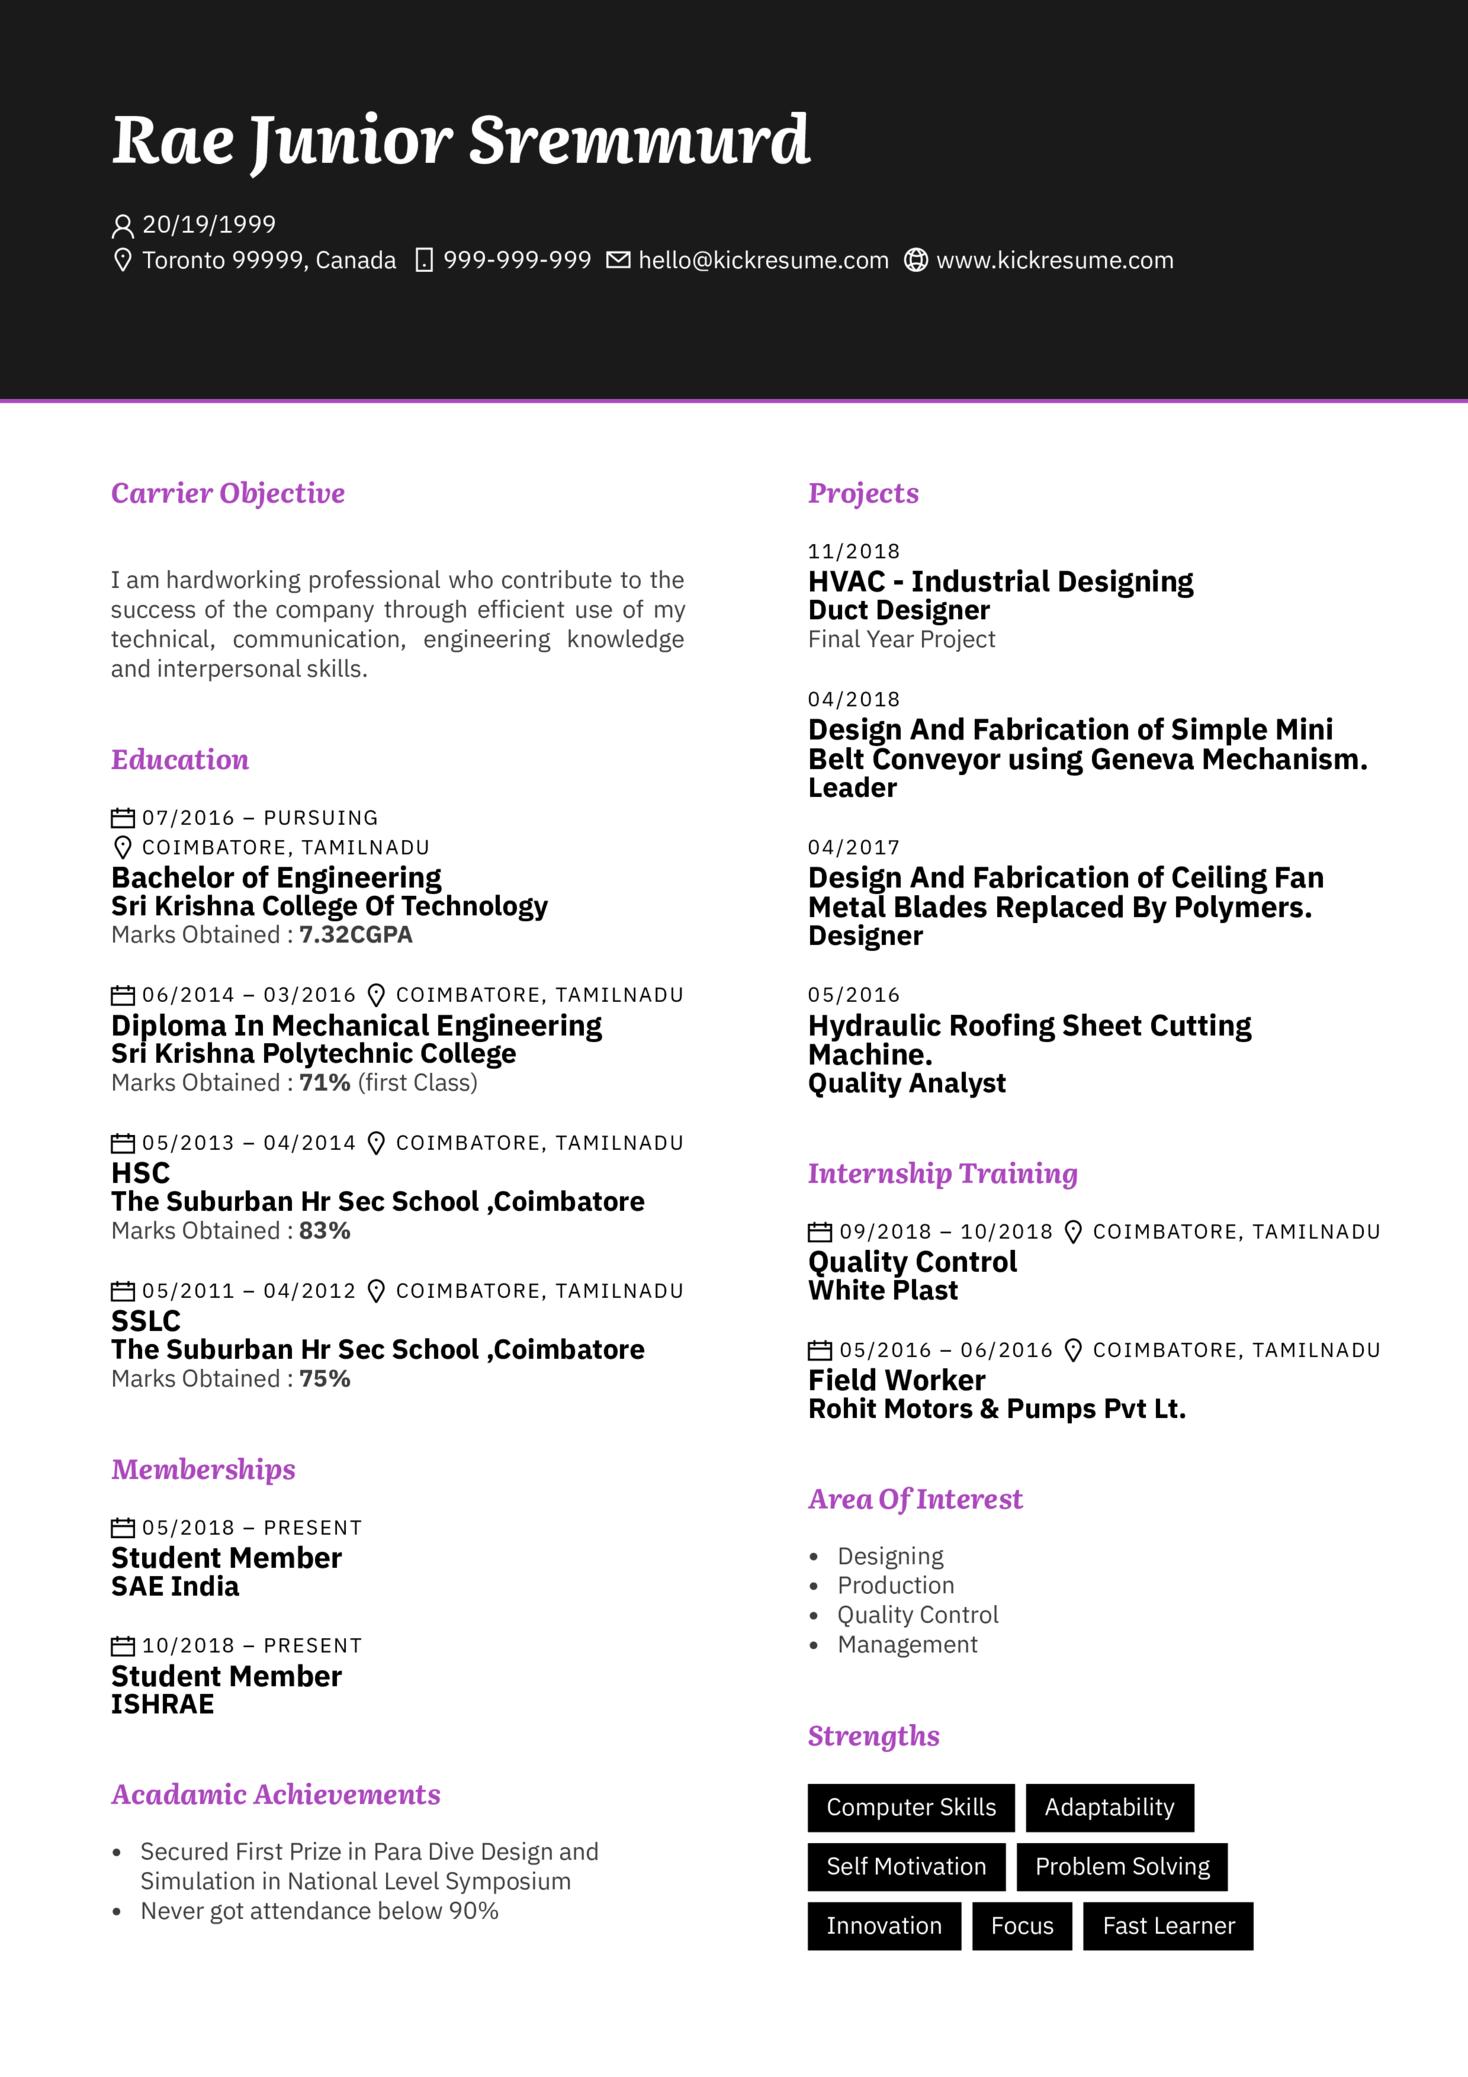 System Design Engineer CV Sample (časť 1)